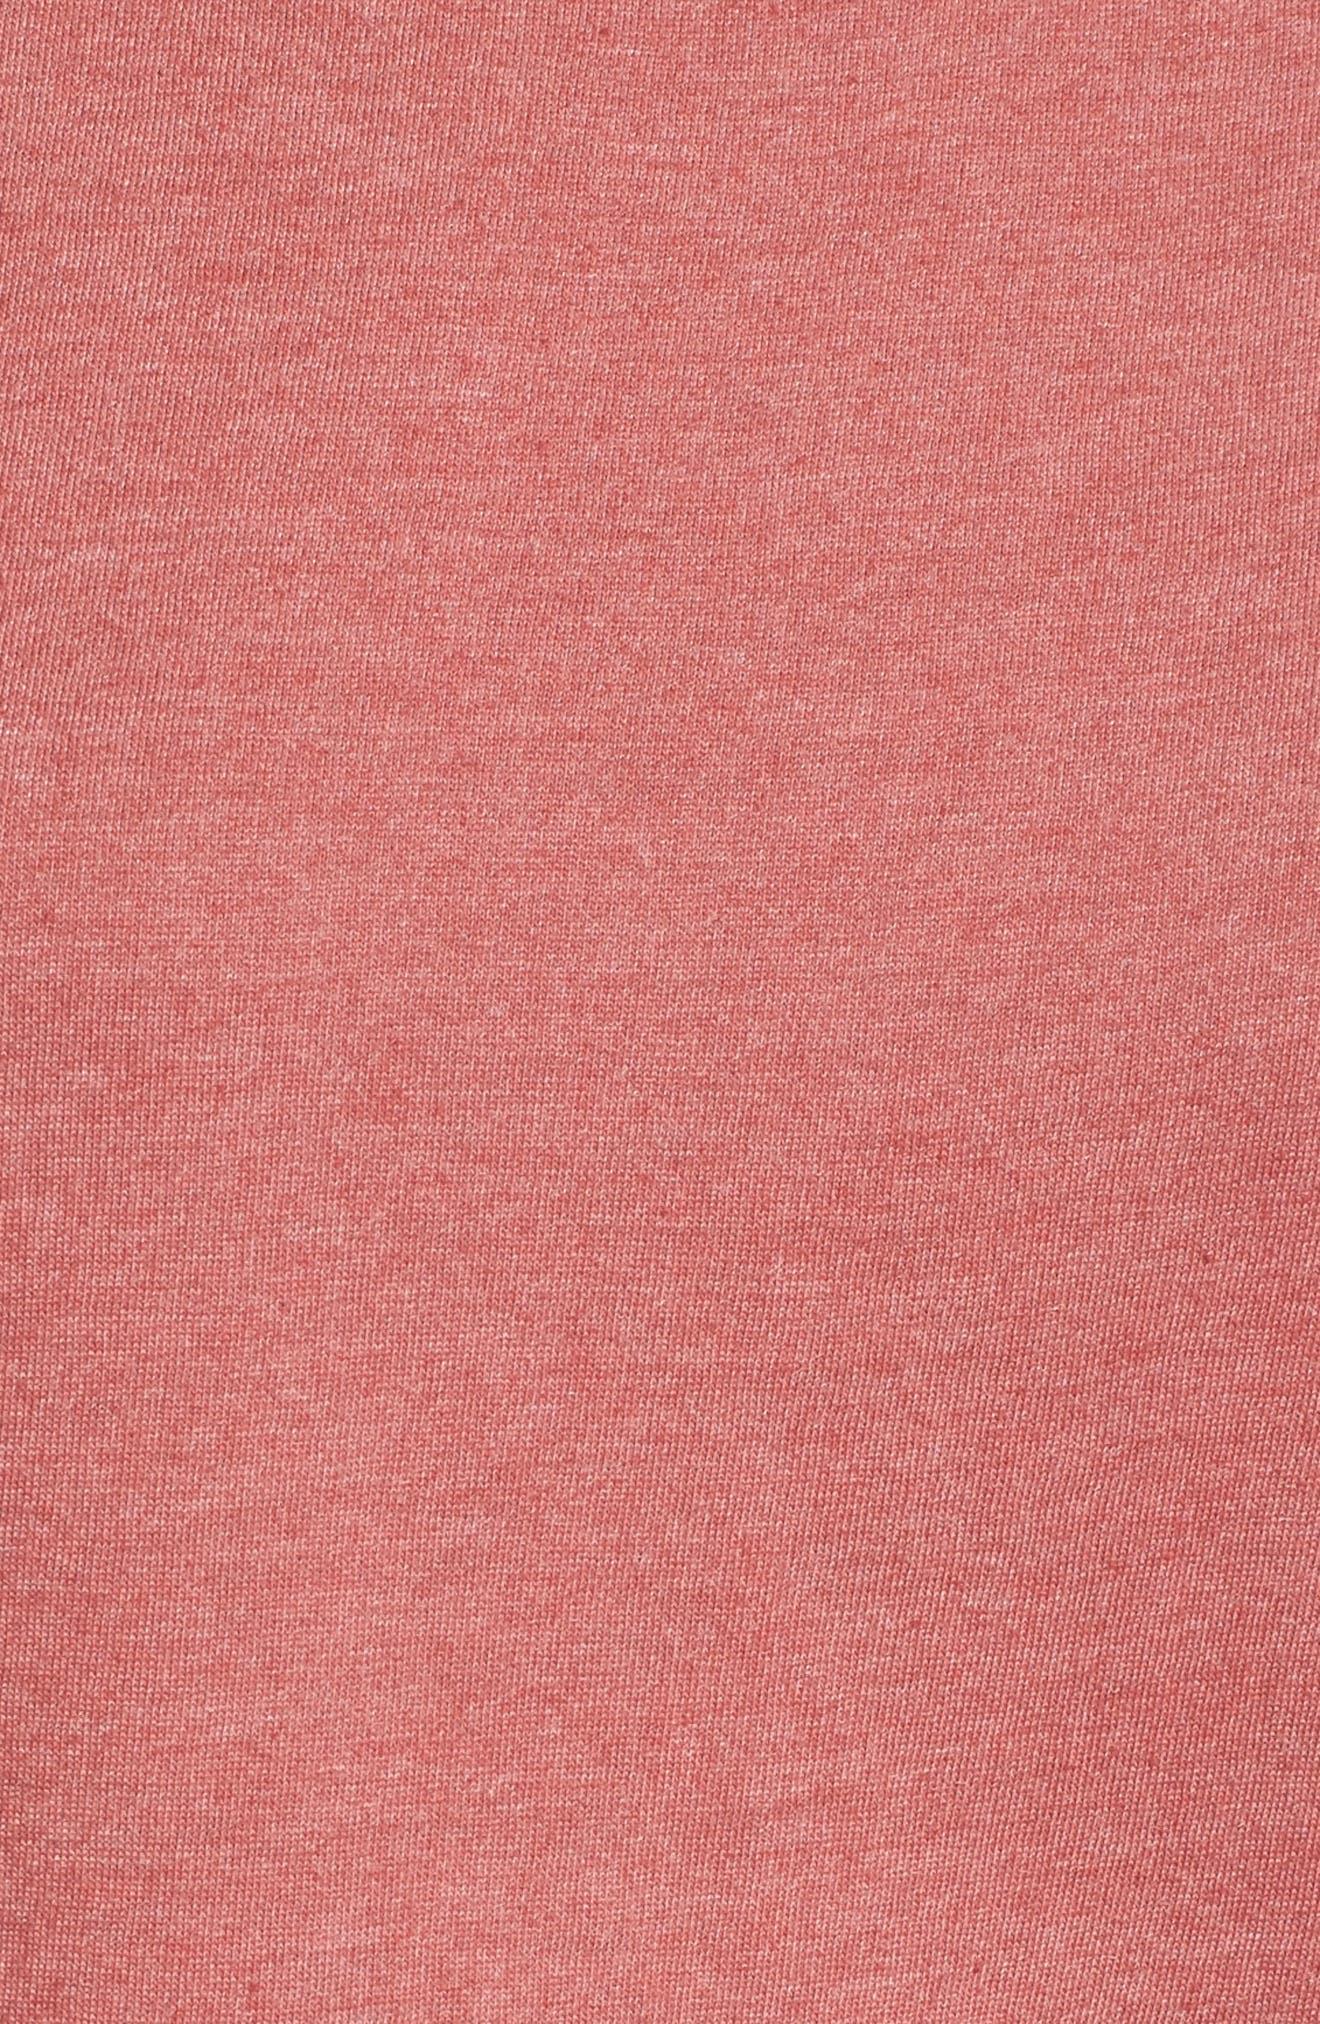 Alternate Image 5  - Caslon® Peplum Tee (Regular & Petite)